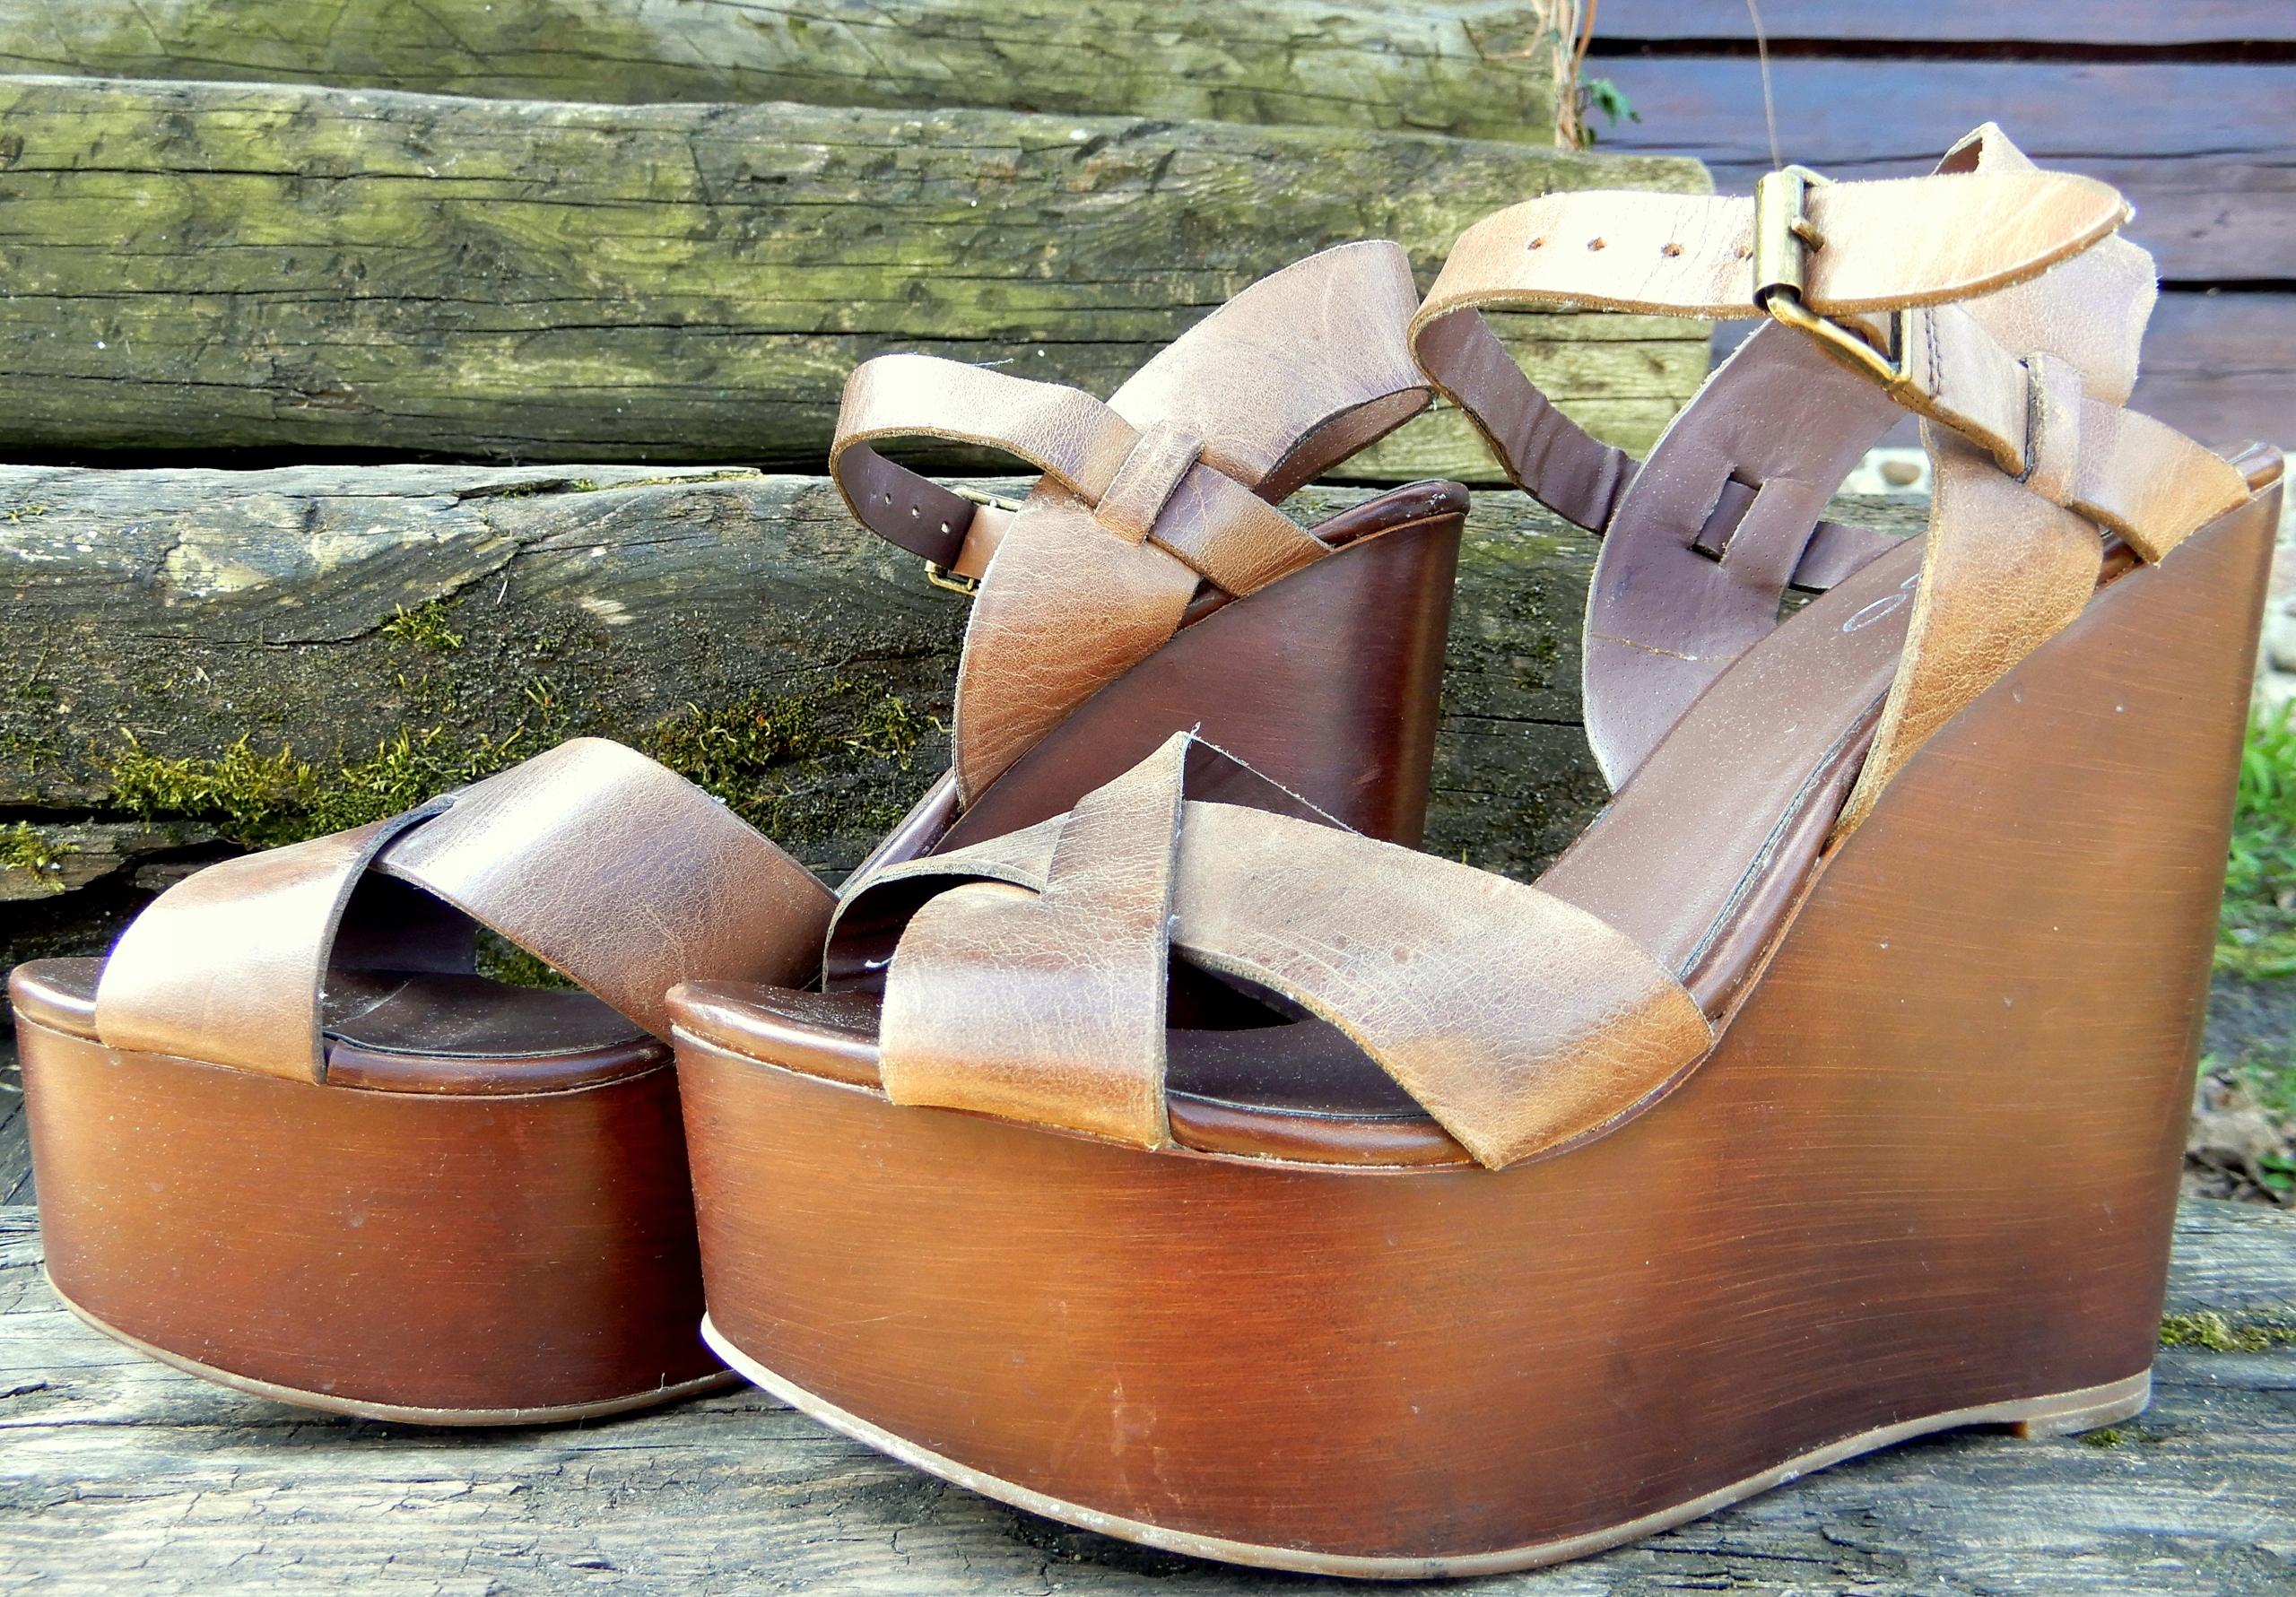 ALDO, skórzane sandały na koturnie, platformie, 38